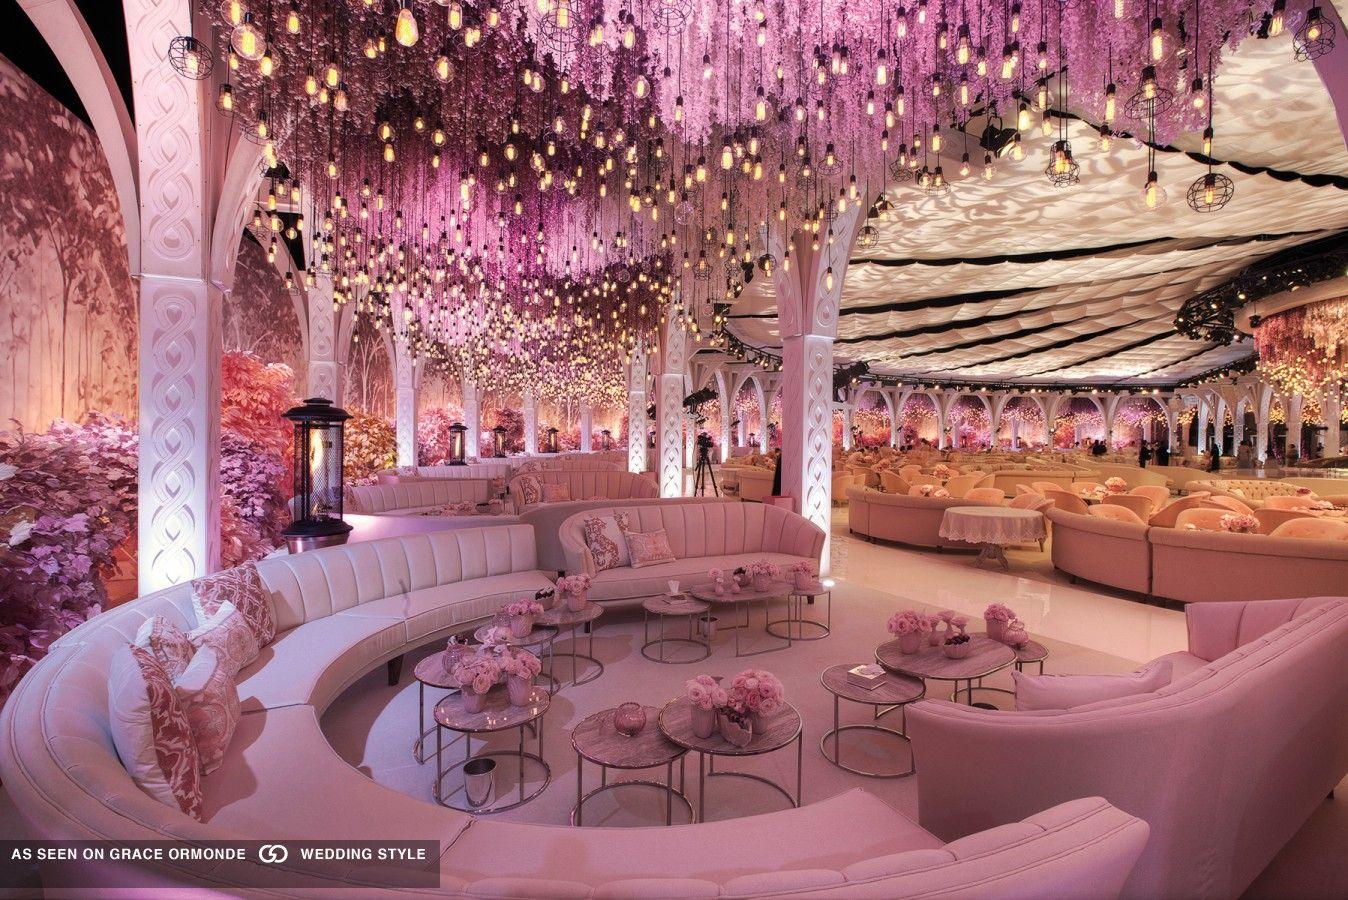 Wedding stage decoration dubai  graceormondefallsneakpeakg   All things